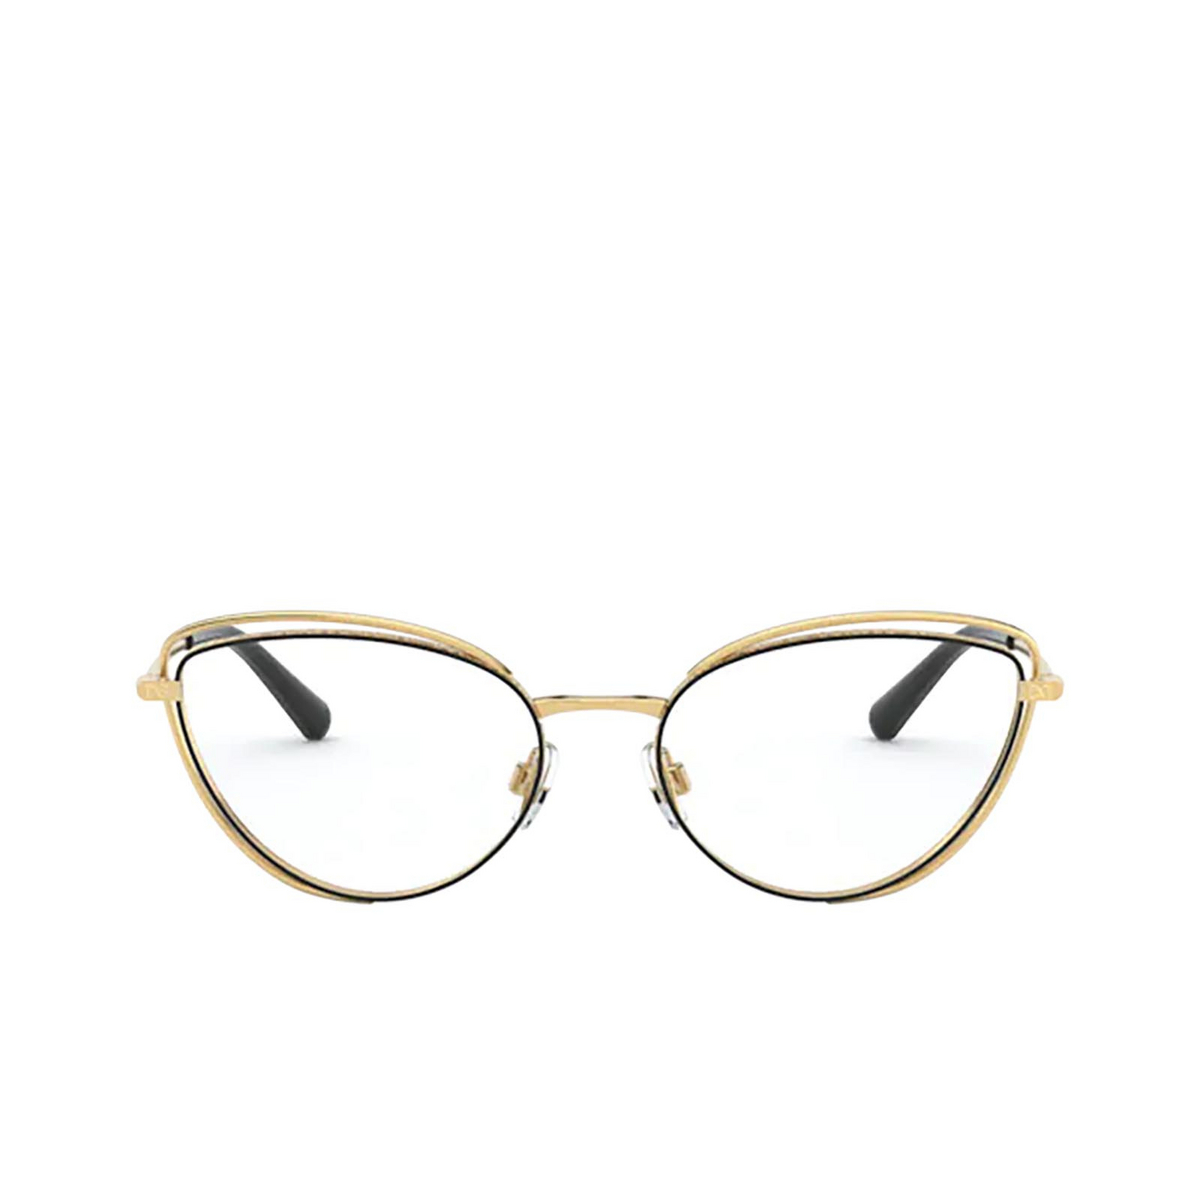 Dolce & Gabbana® Cat-eye Eyeglasses: DG1326 color Gold / Black 1334 - front view.